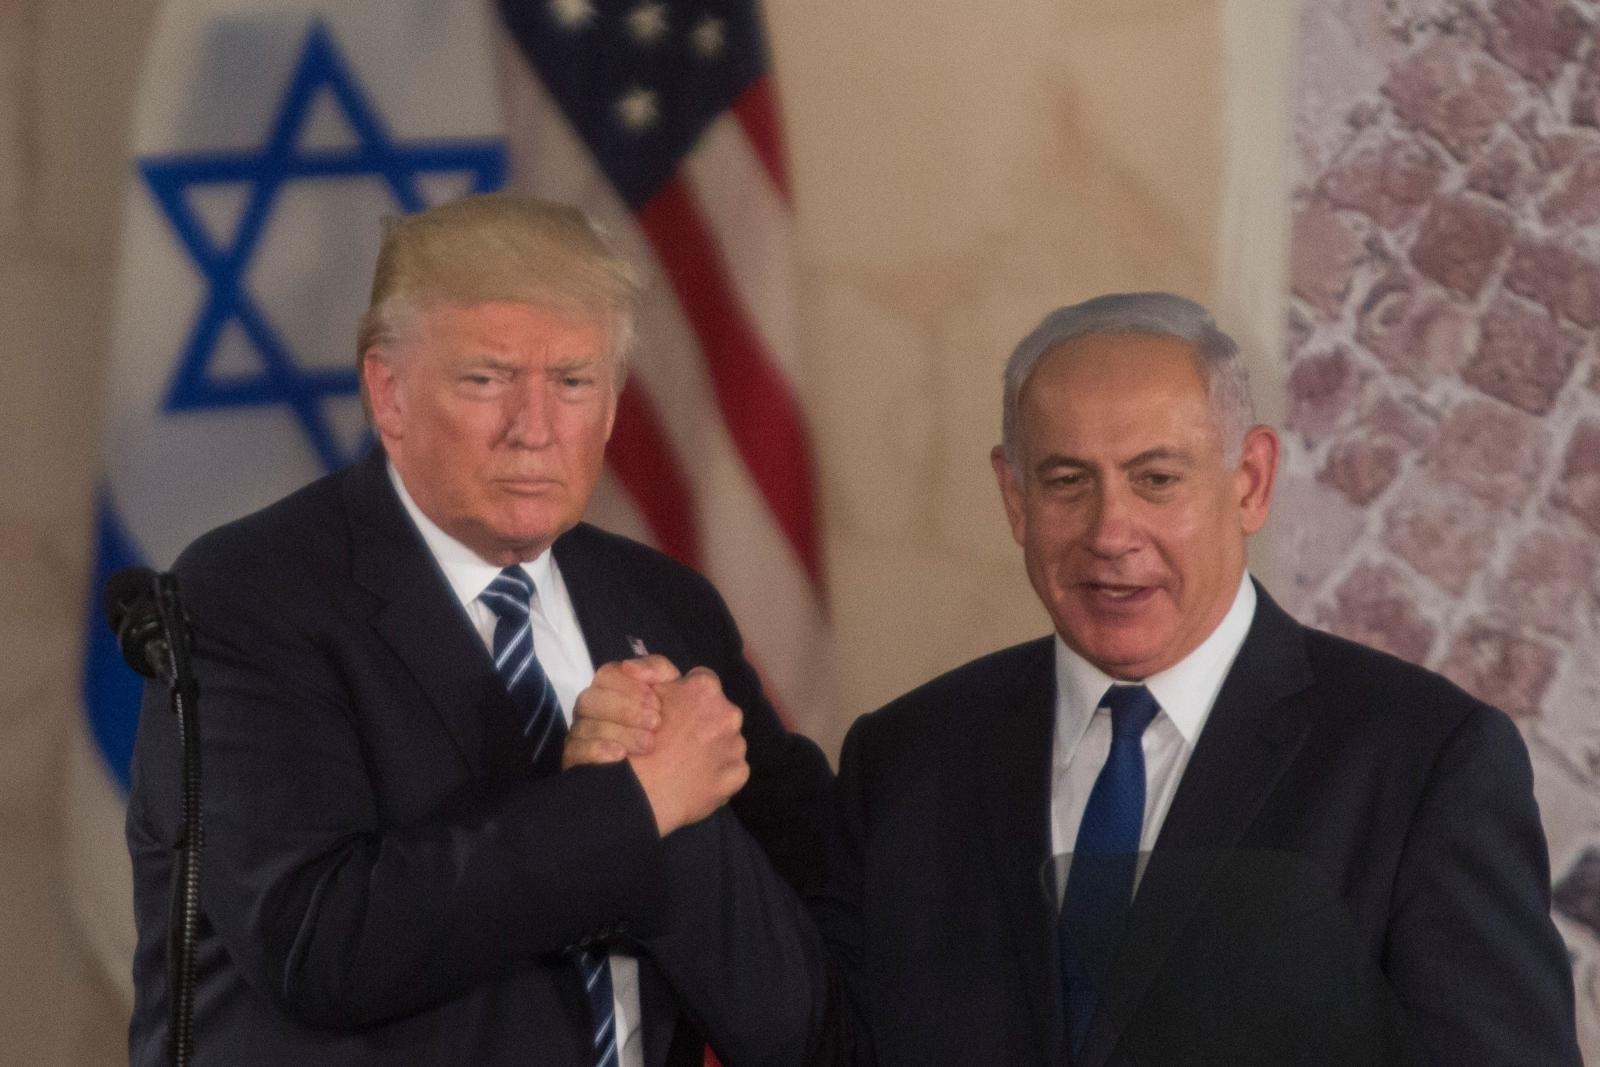 Trump and Netanyahu